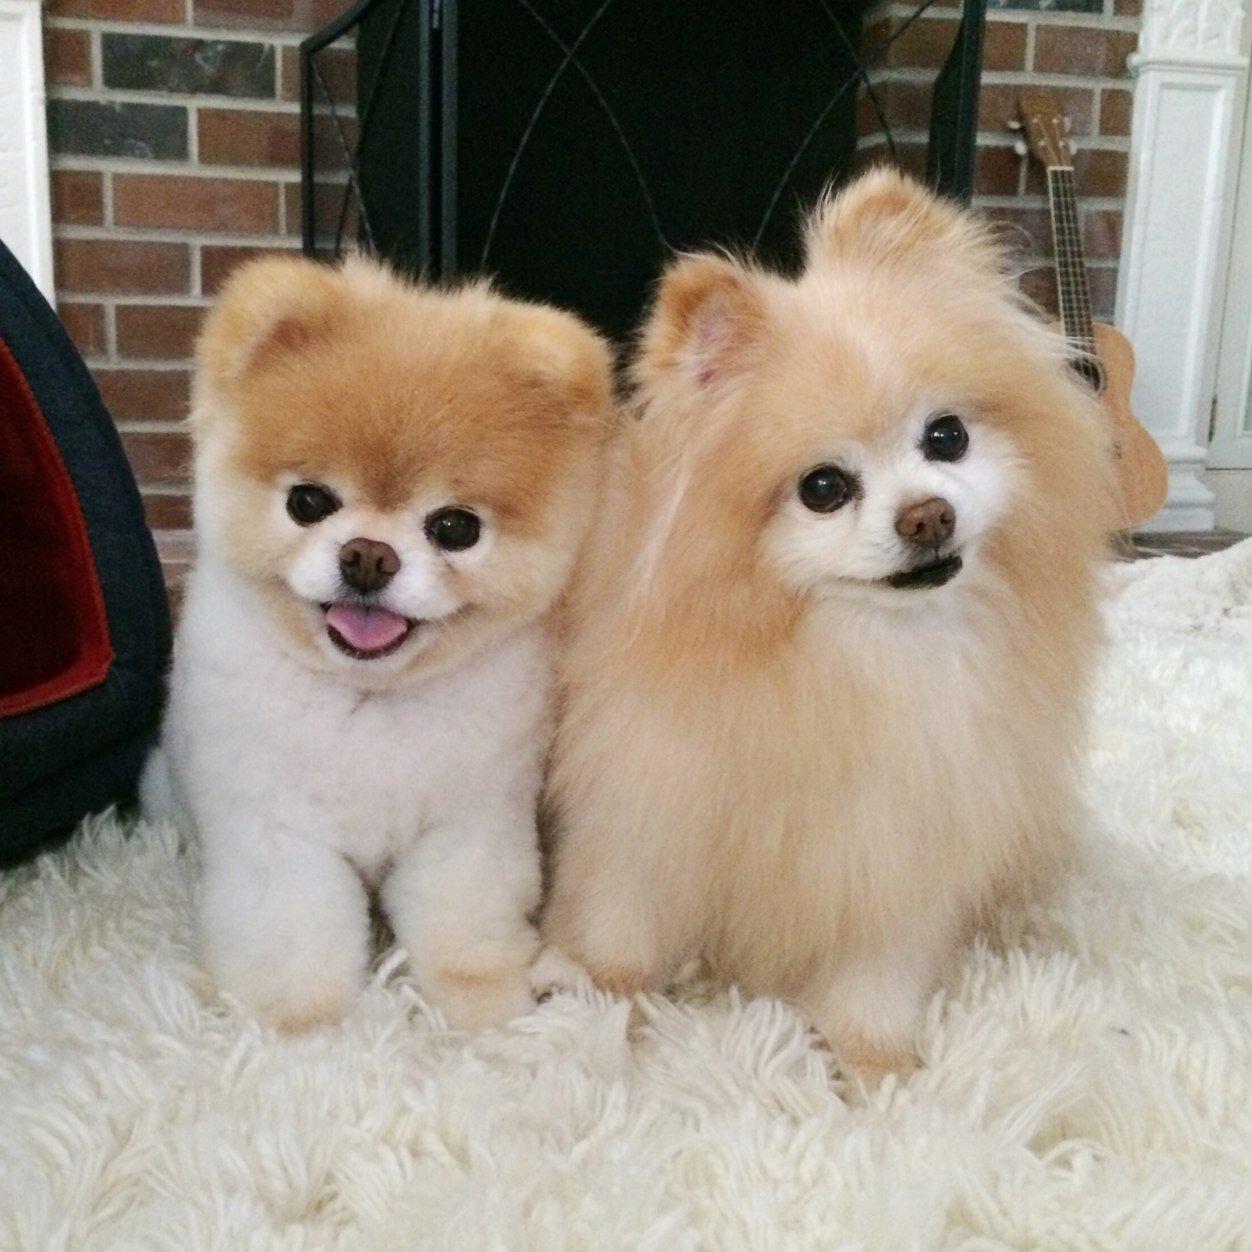 Fullsize Of Cutest Dog Ever